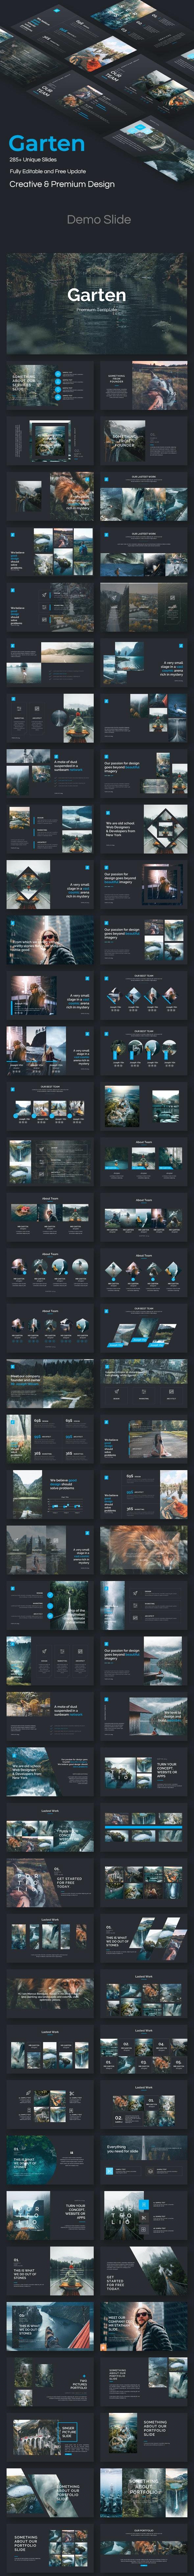 Garten Creative Design Google Slide Template - Google Slides Presentation Templates